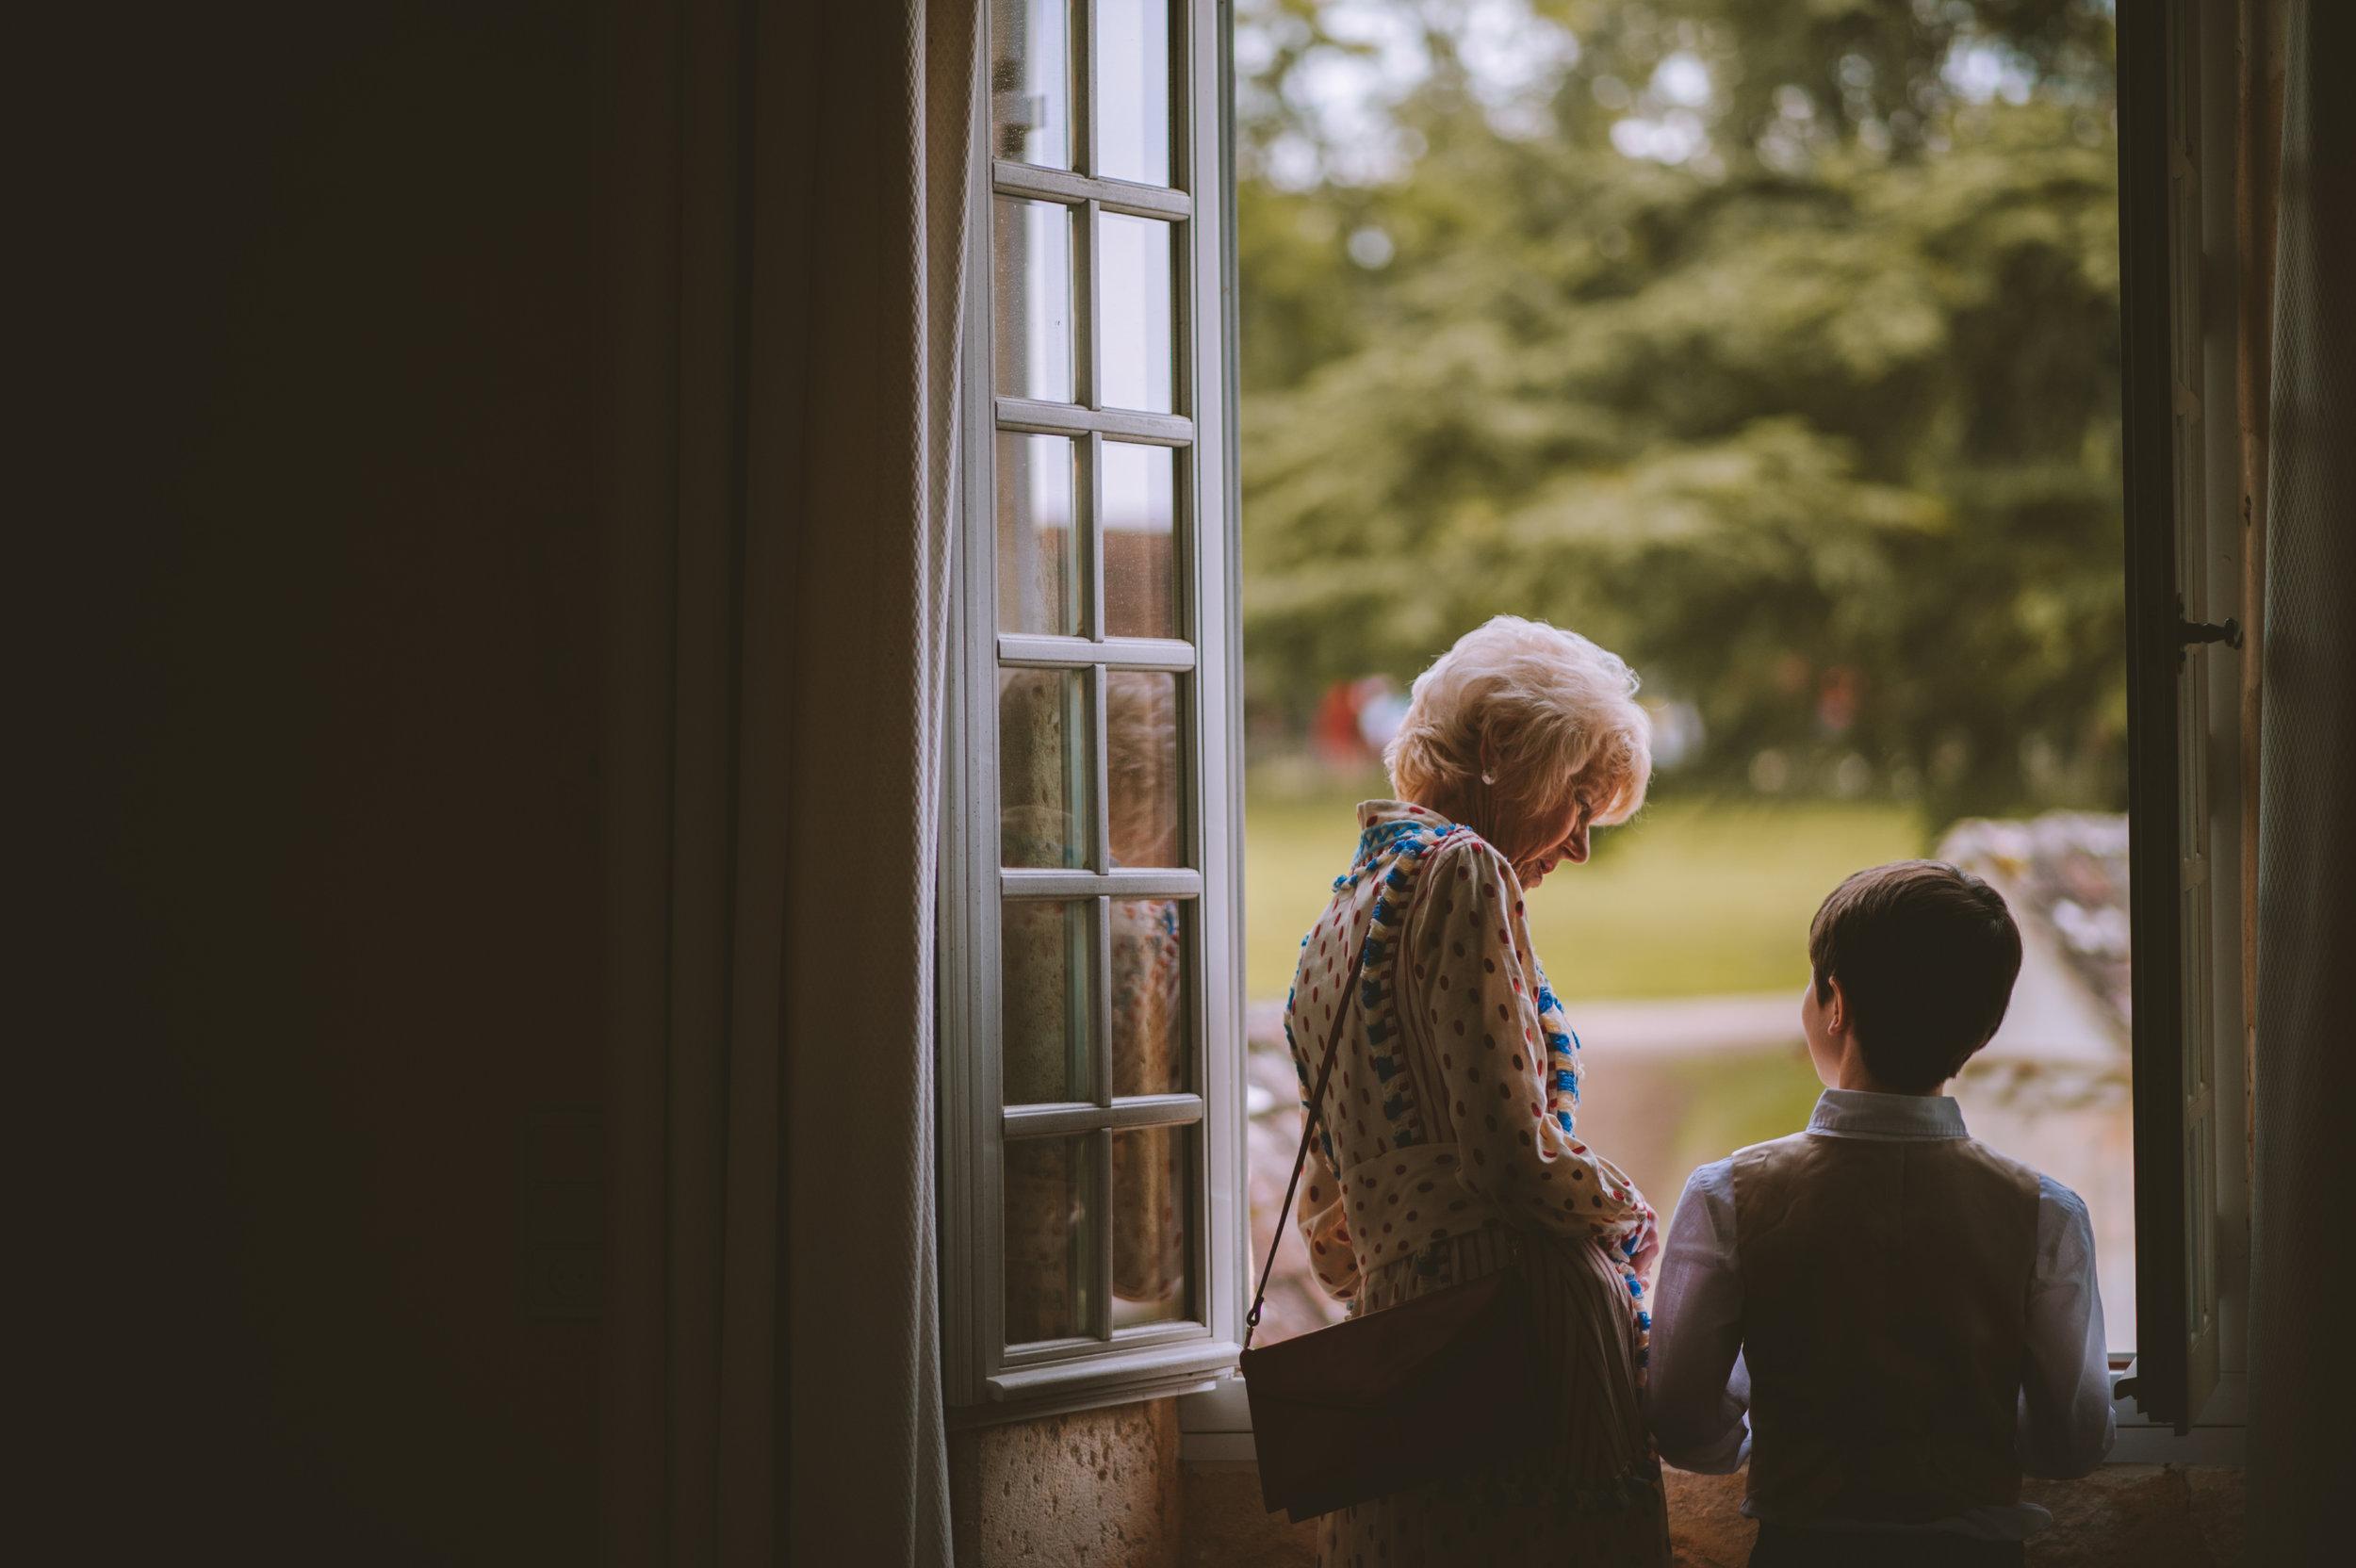 dordogne-wedding-photographer-mark-shaw-1.jpg